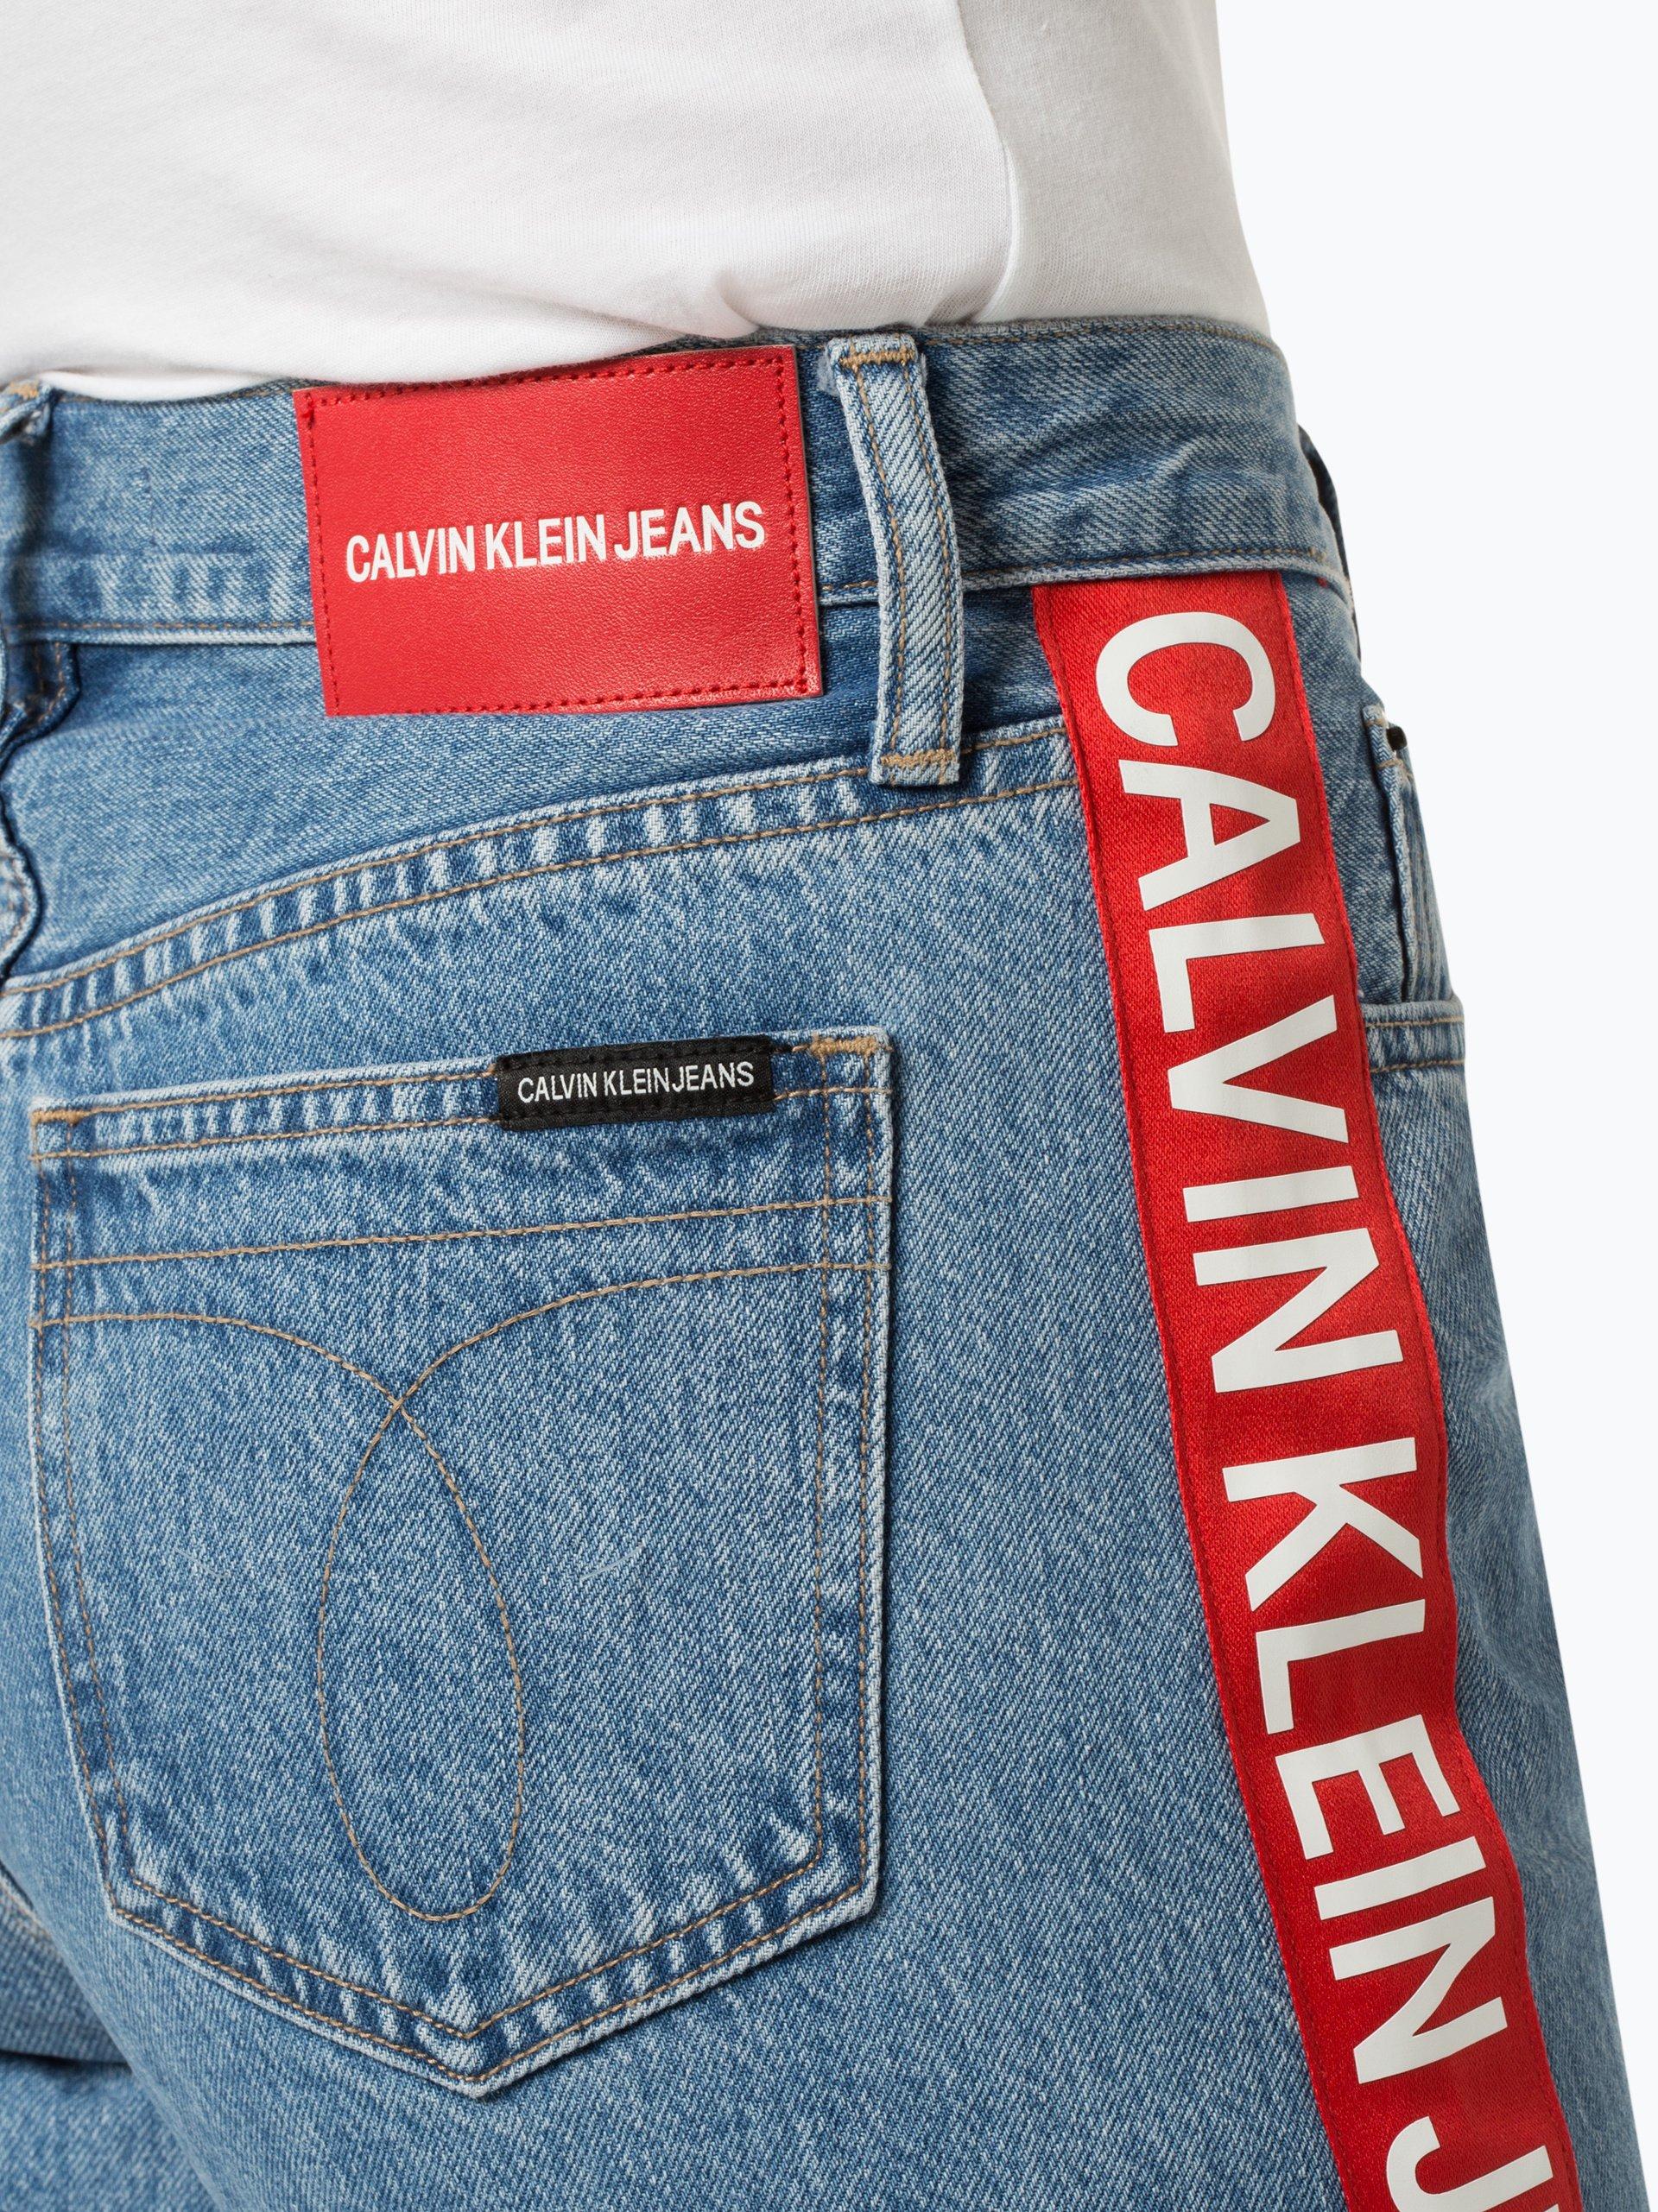 Calvin Klein Jeans Damen Jeans - CKJ 030